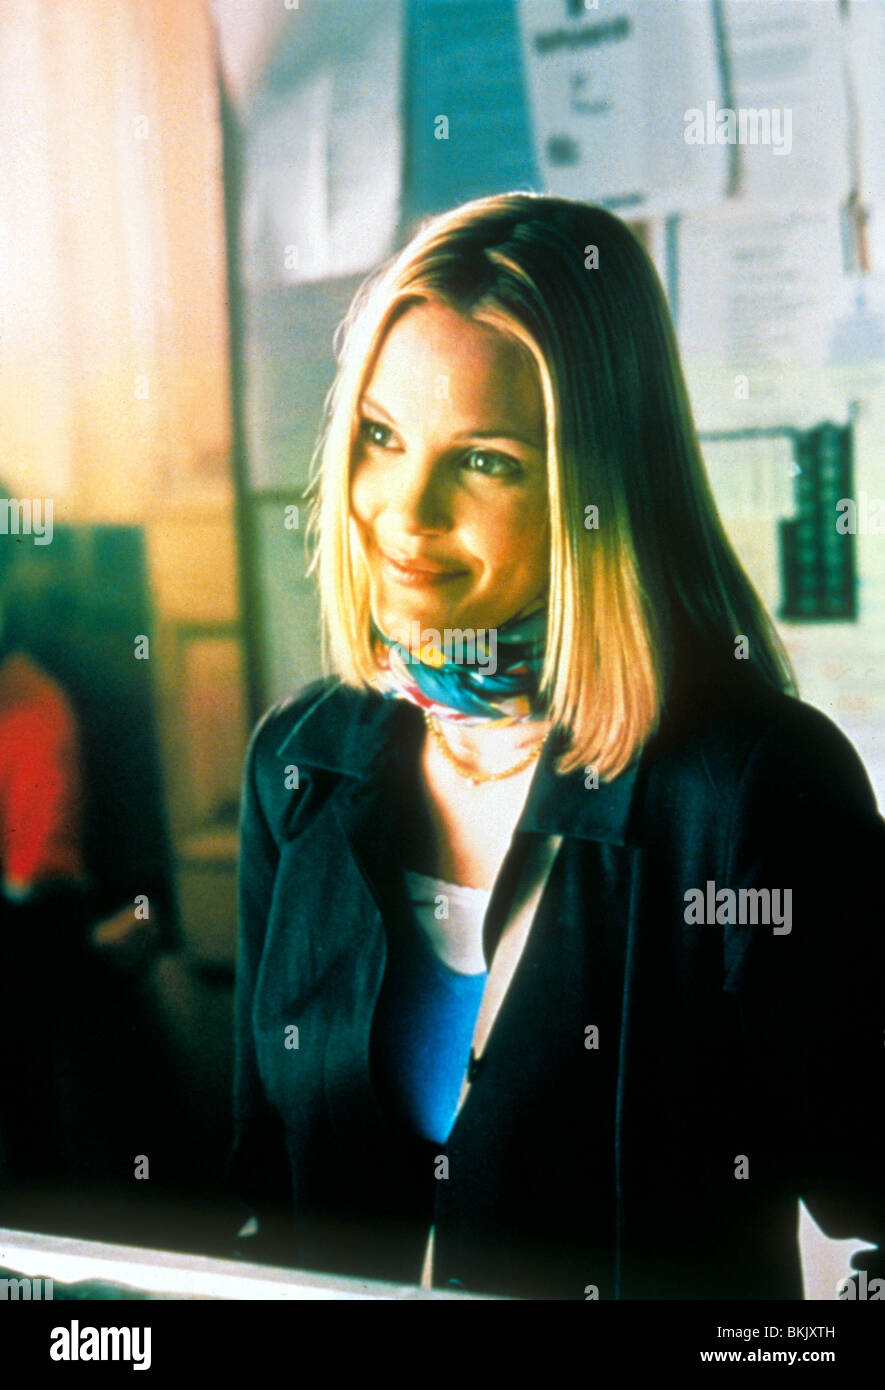 Melanie Vallejo Hot pics Emily Beecham (born 1984 (dual British and American citizenship),Brigitte Lahaie